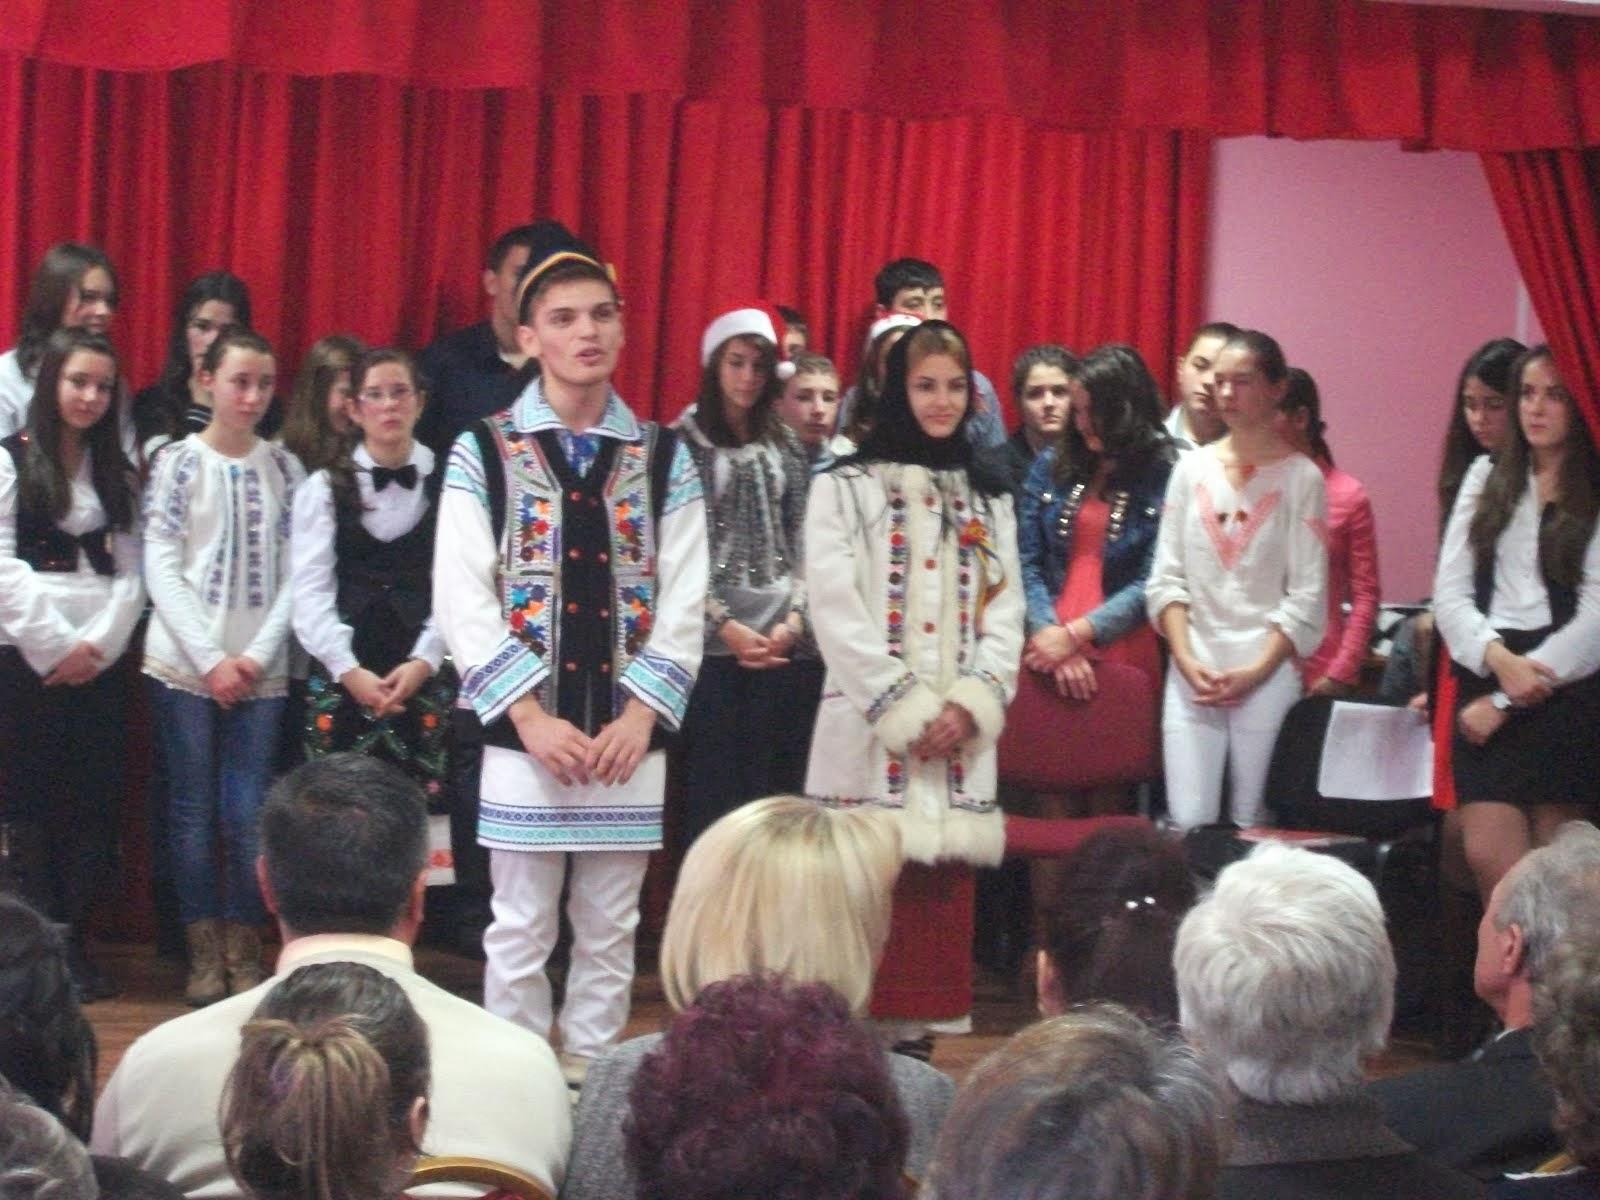 Aspecte de la serbarea de Crăciun, Liceul Teoretic Roznov, 18.12.2013...